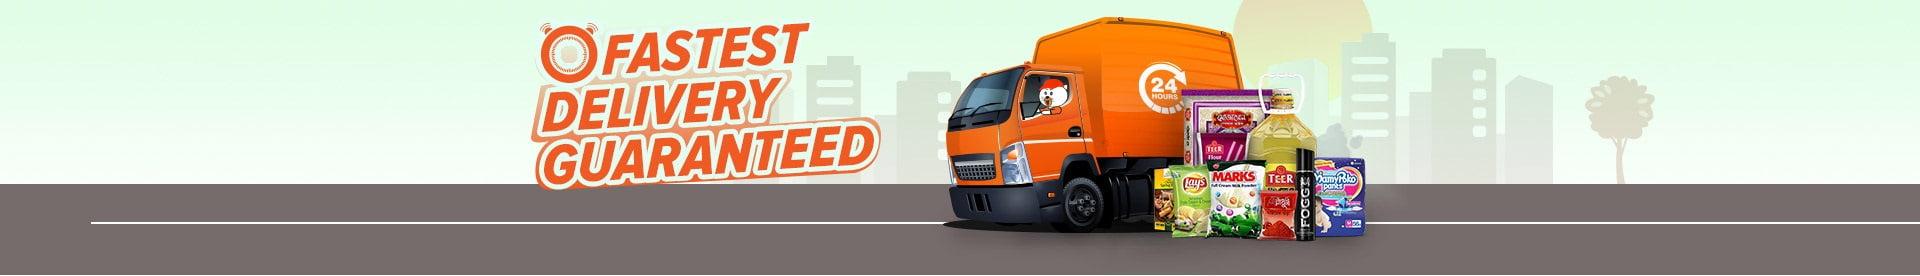 fastest grocery delivery-daraz.com.bd